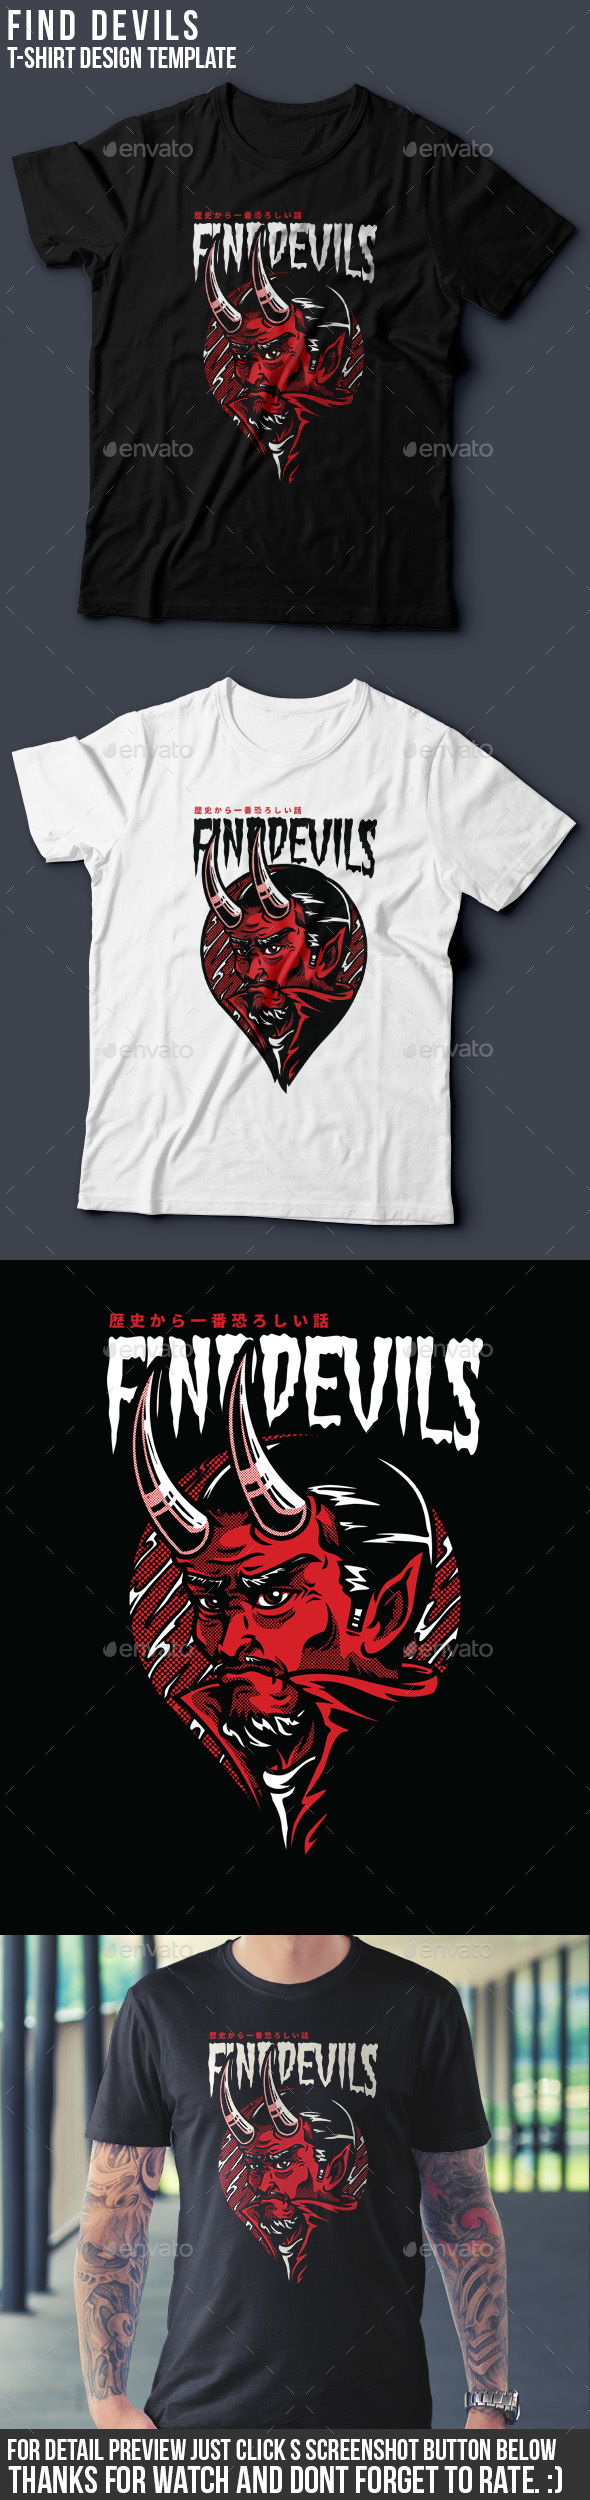 Find Devils T-Shirt Design - Grunge Designs